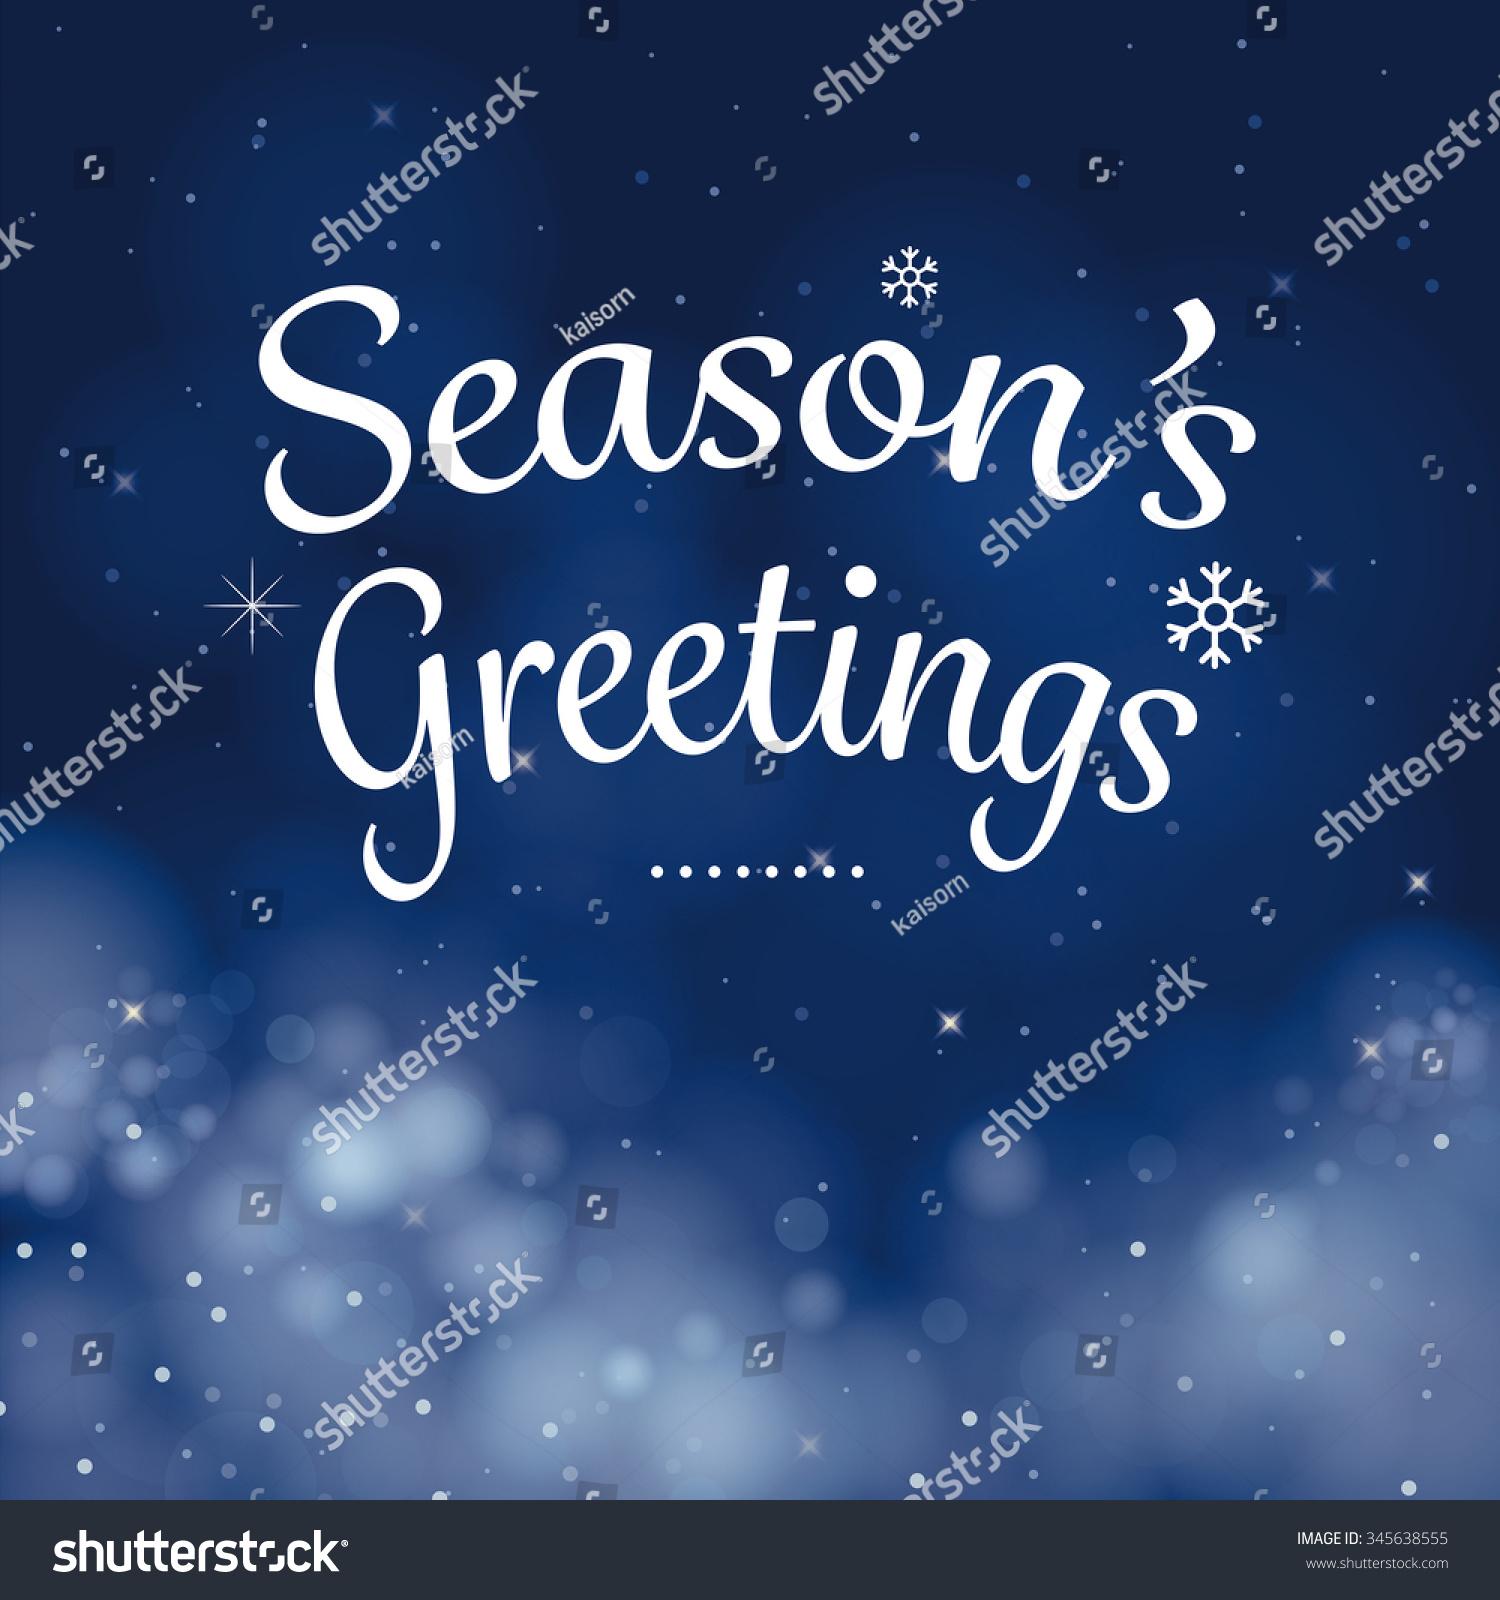 Seasons Greetings Calligraphy Card Vector Design Stock Vector